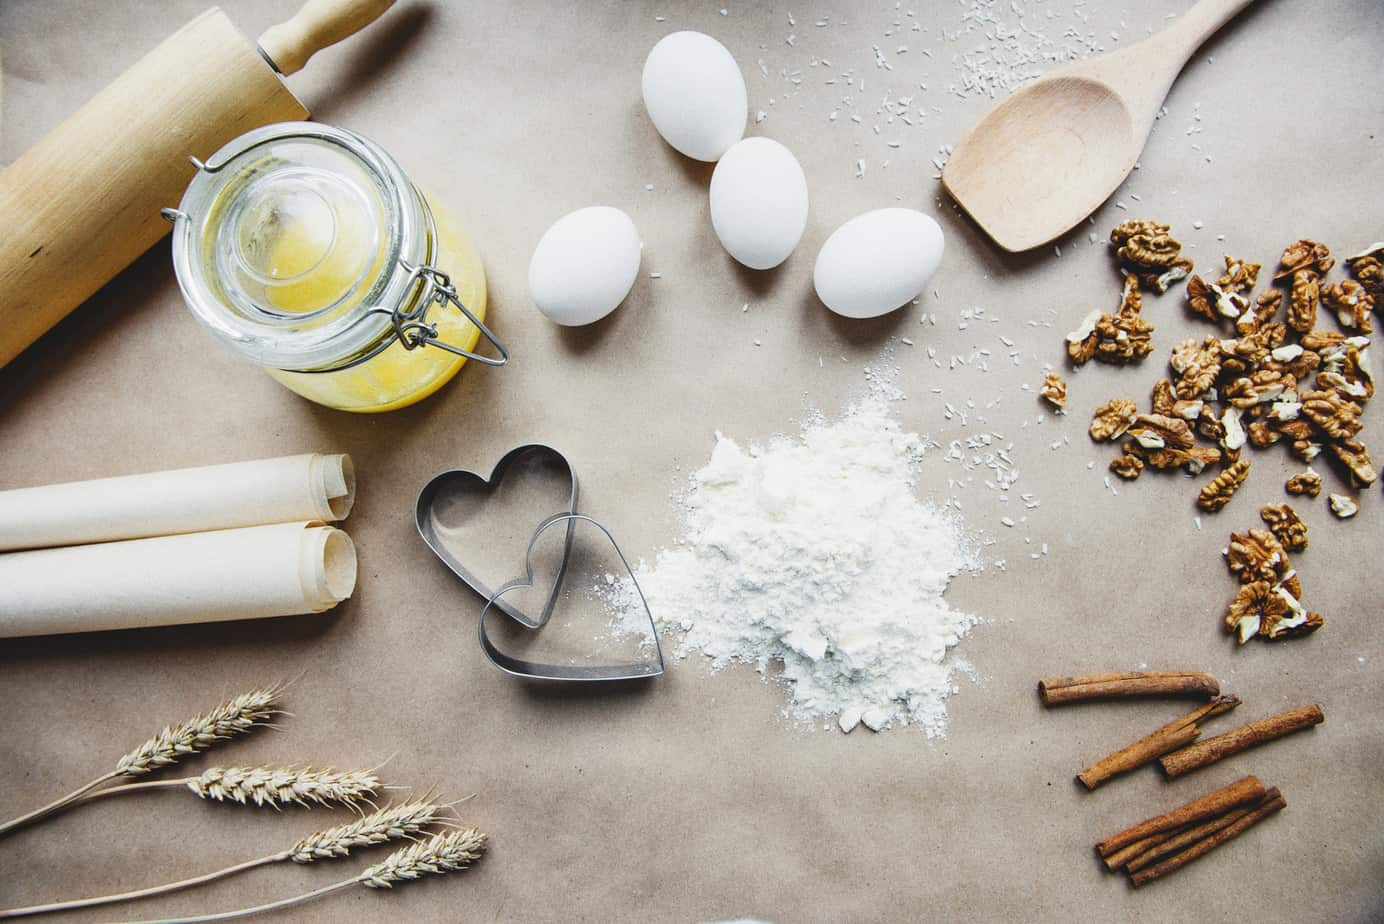 baking with collagen peptides powder